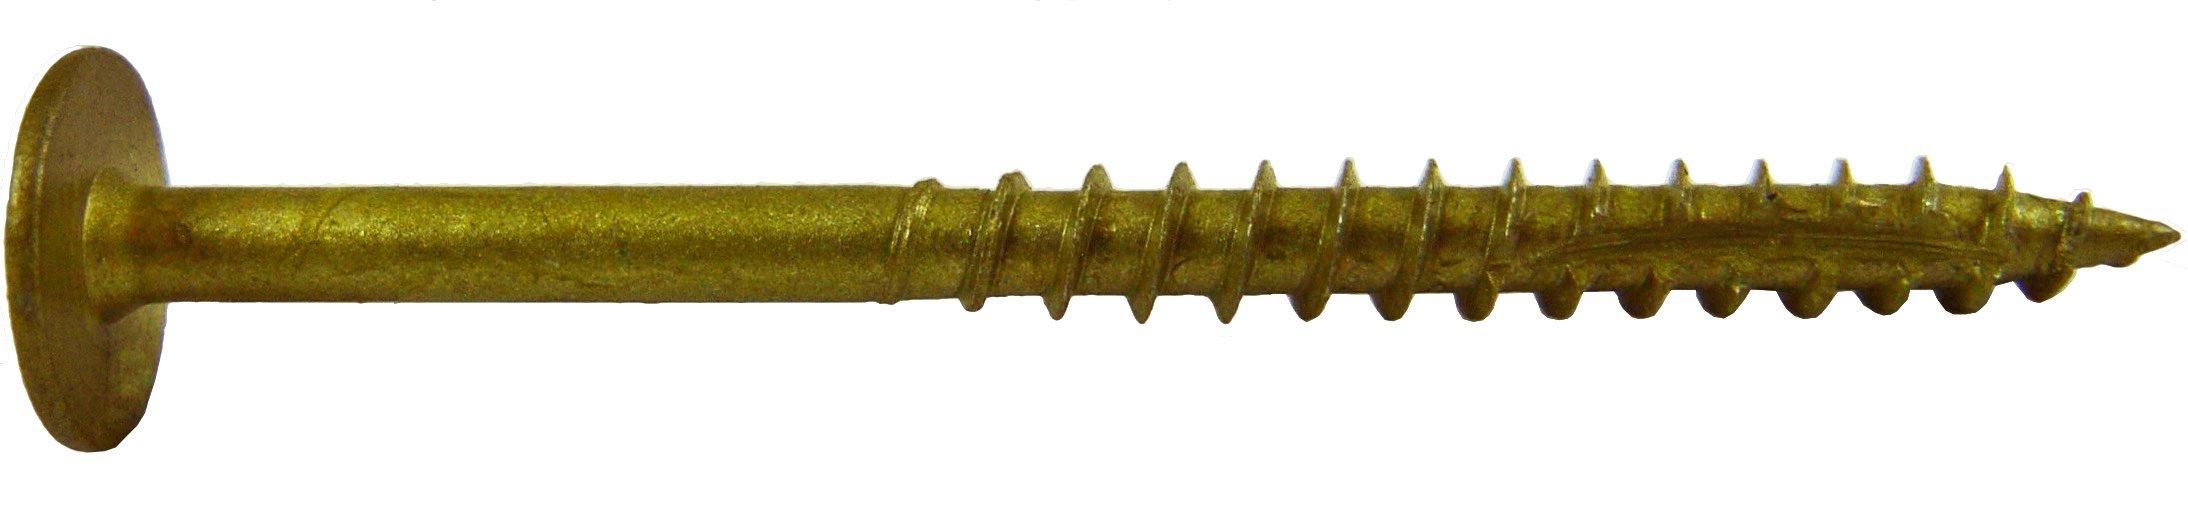 #7 x 1-5/8'' Bronze Star Exterior Coated Modified Truss Head - WHITE HEAD Cabinet Wood Screw Torx/Star Drive Head (1 pound) - Multipurpose Exterior Coated Torx/Star Drive Wood Screws